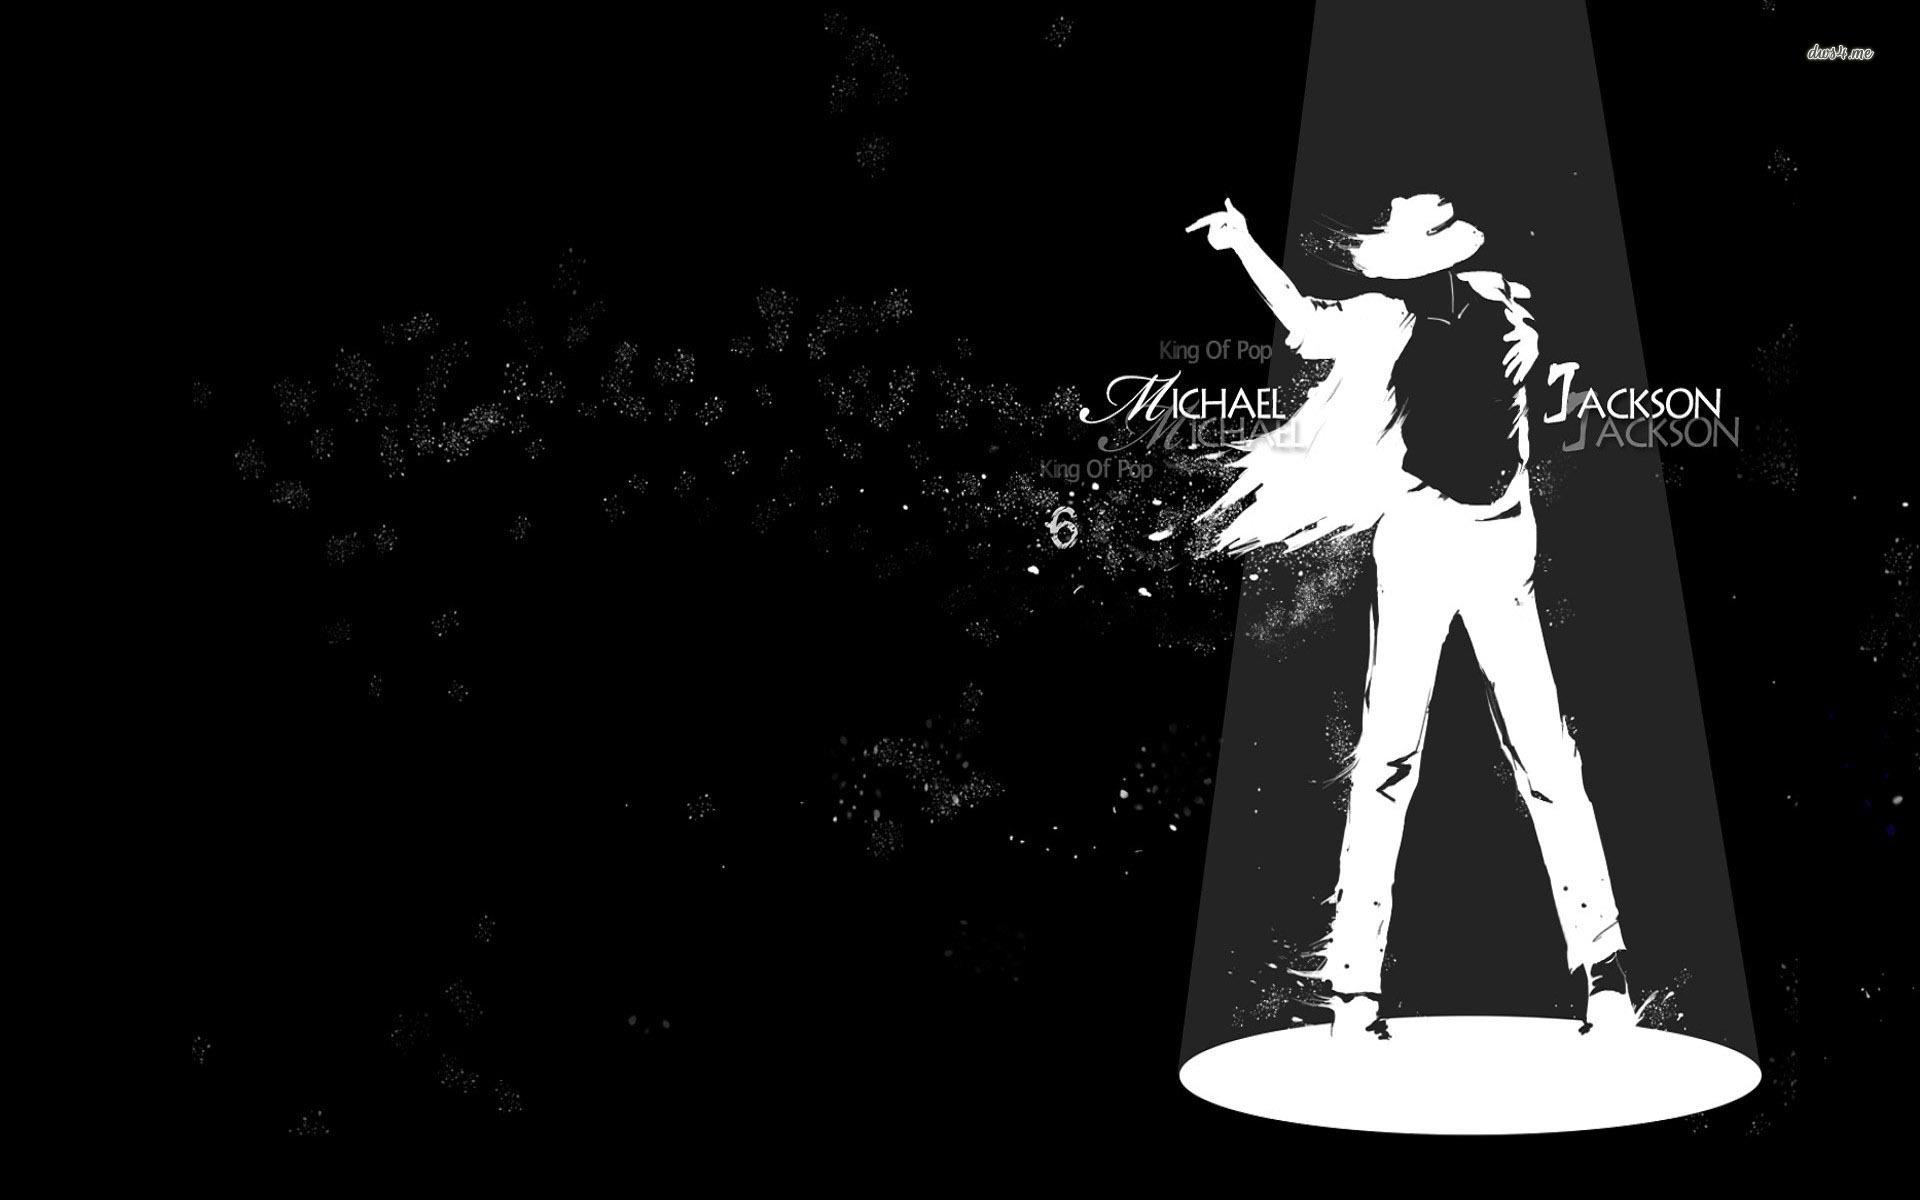 Michael Jackson Wallpapers HD white suit hat